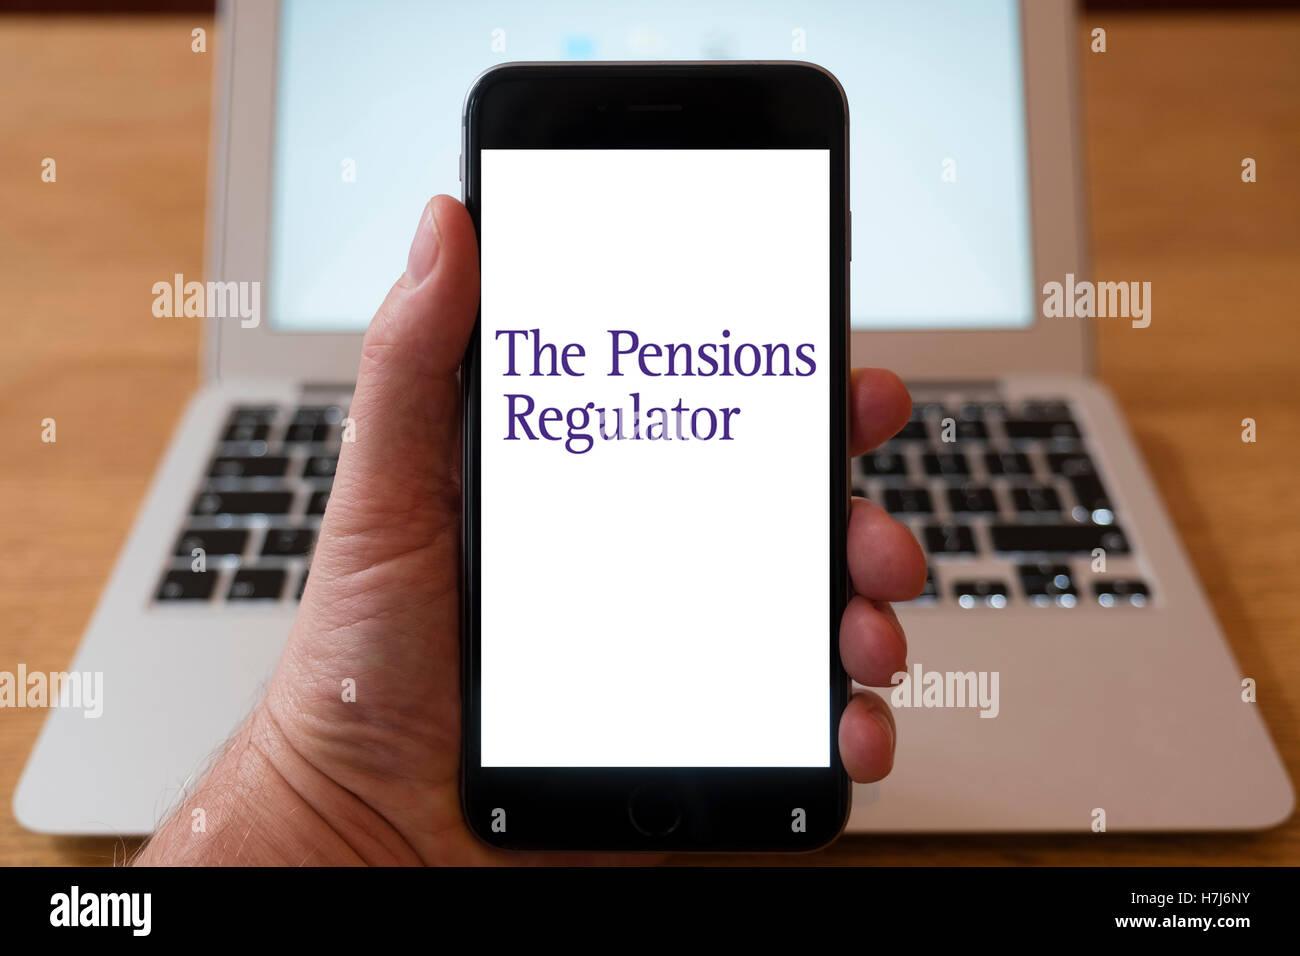 Using iPhone smart phone to display logo of The Pensions Regulator - Stock Image